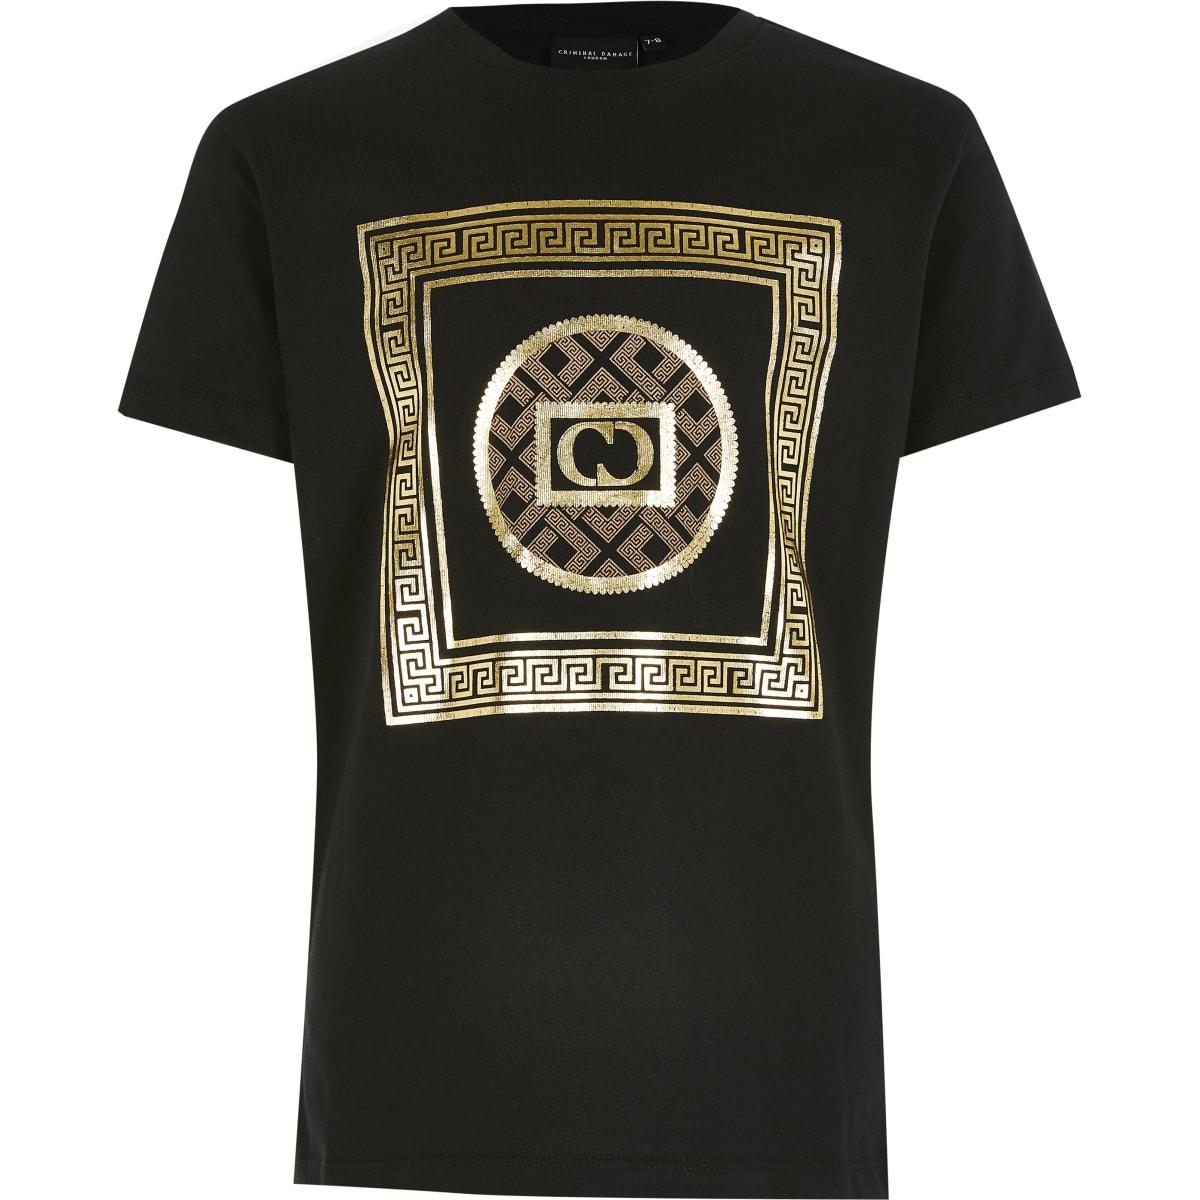 Criminal Damage – Schwarzes T-Shirt mit Print